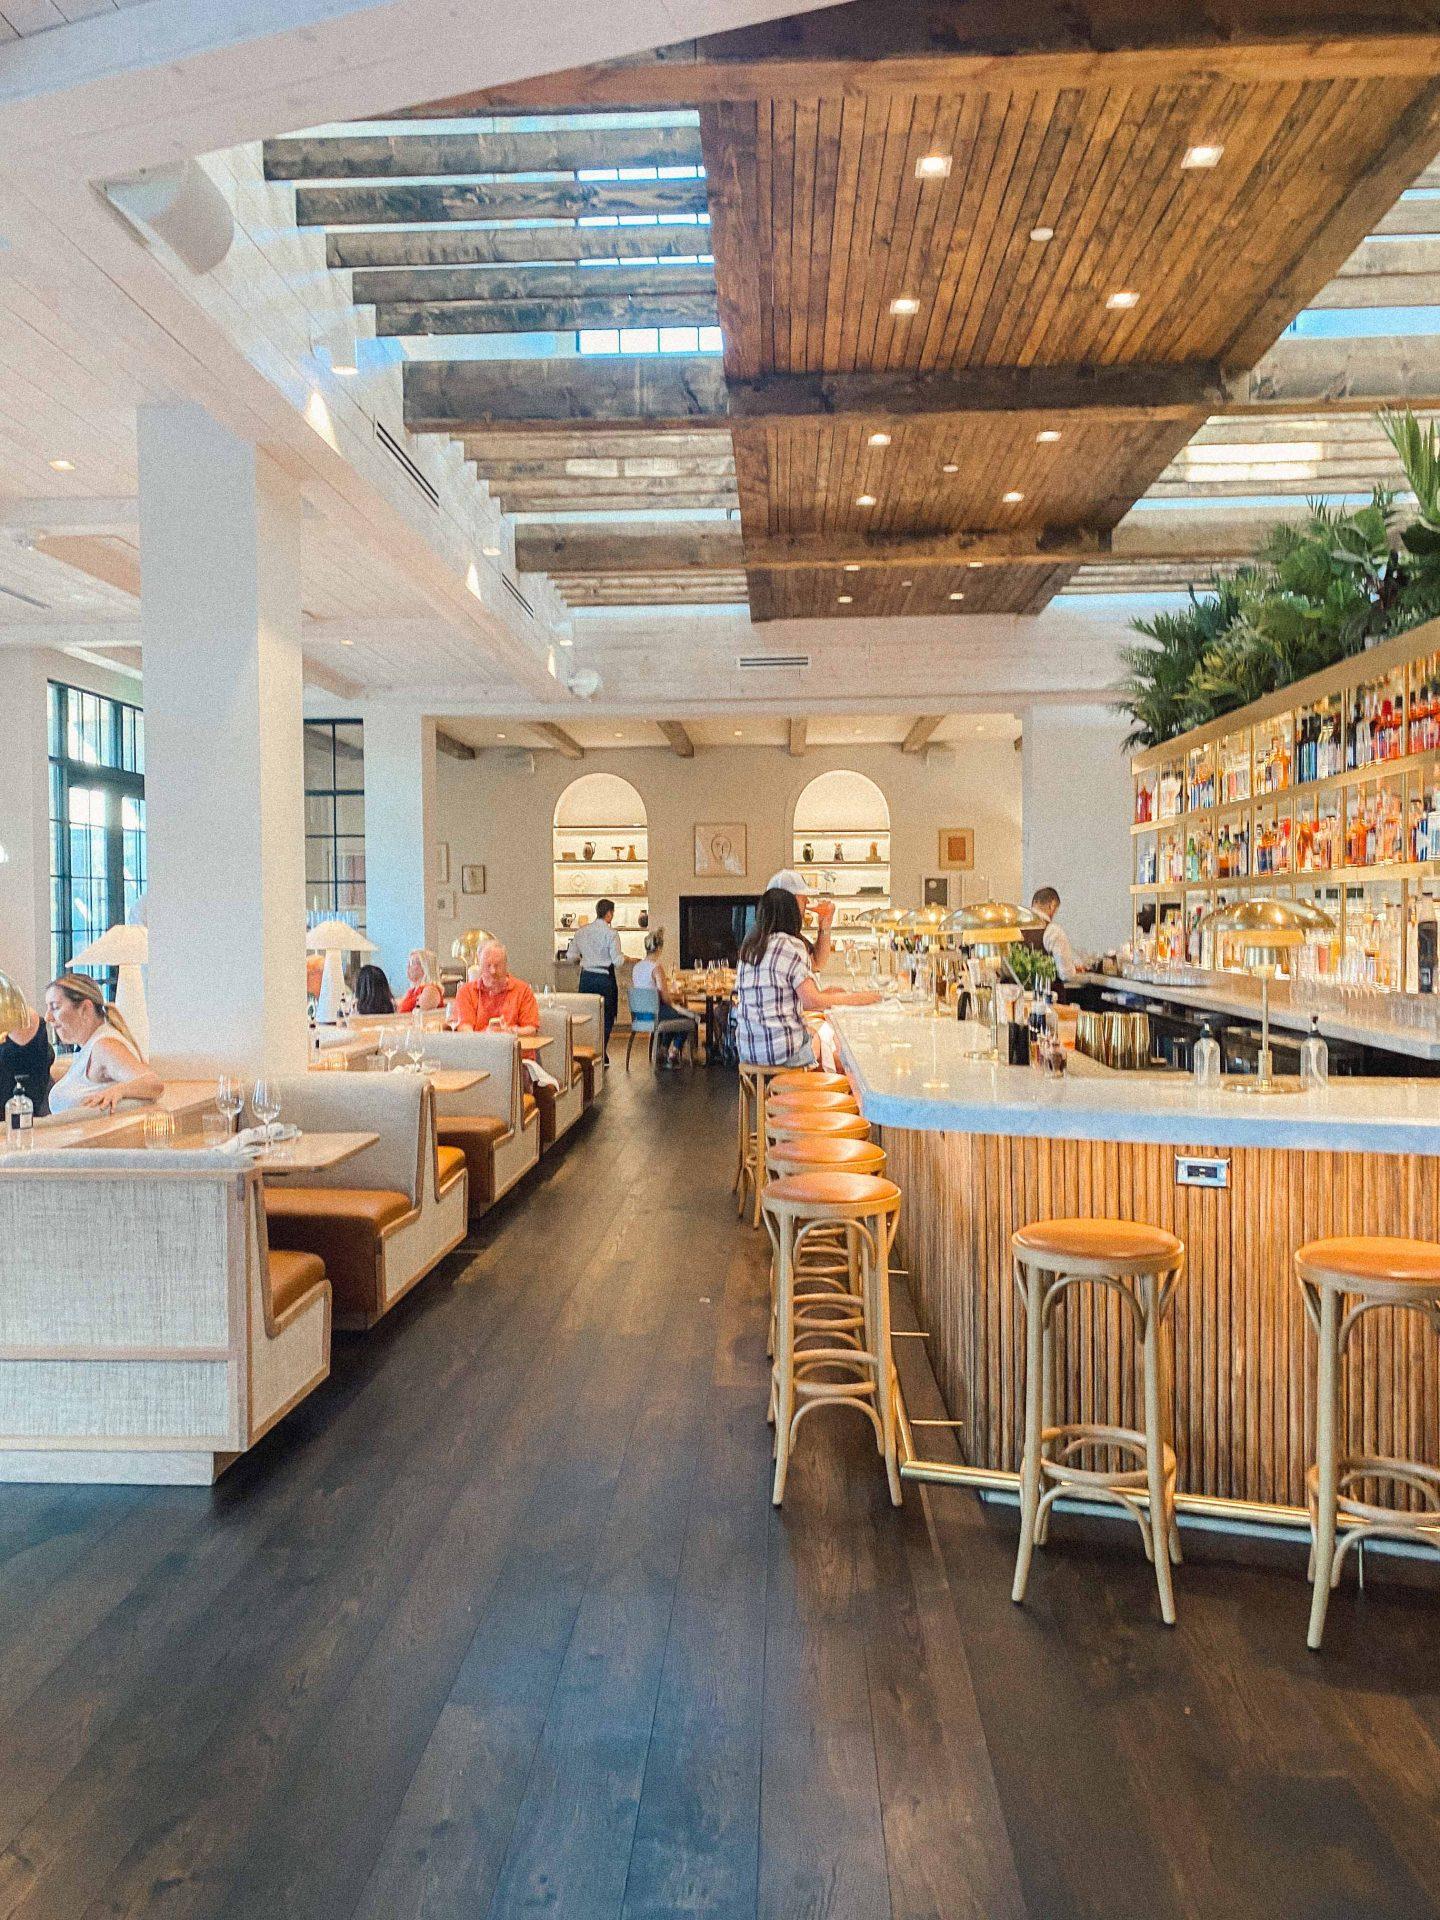 Francine, restaurant, scottsdale Arizona, where to eat Arizona, best restaurants in scottsdale, travel guide, travel blog scottsdale, blog guide